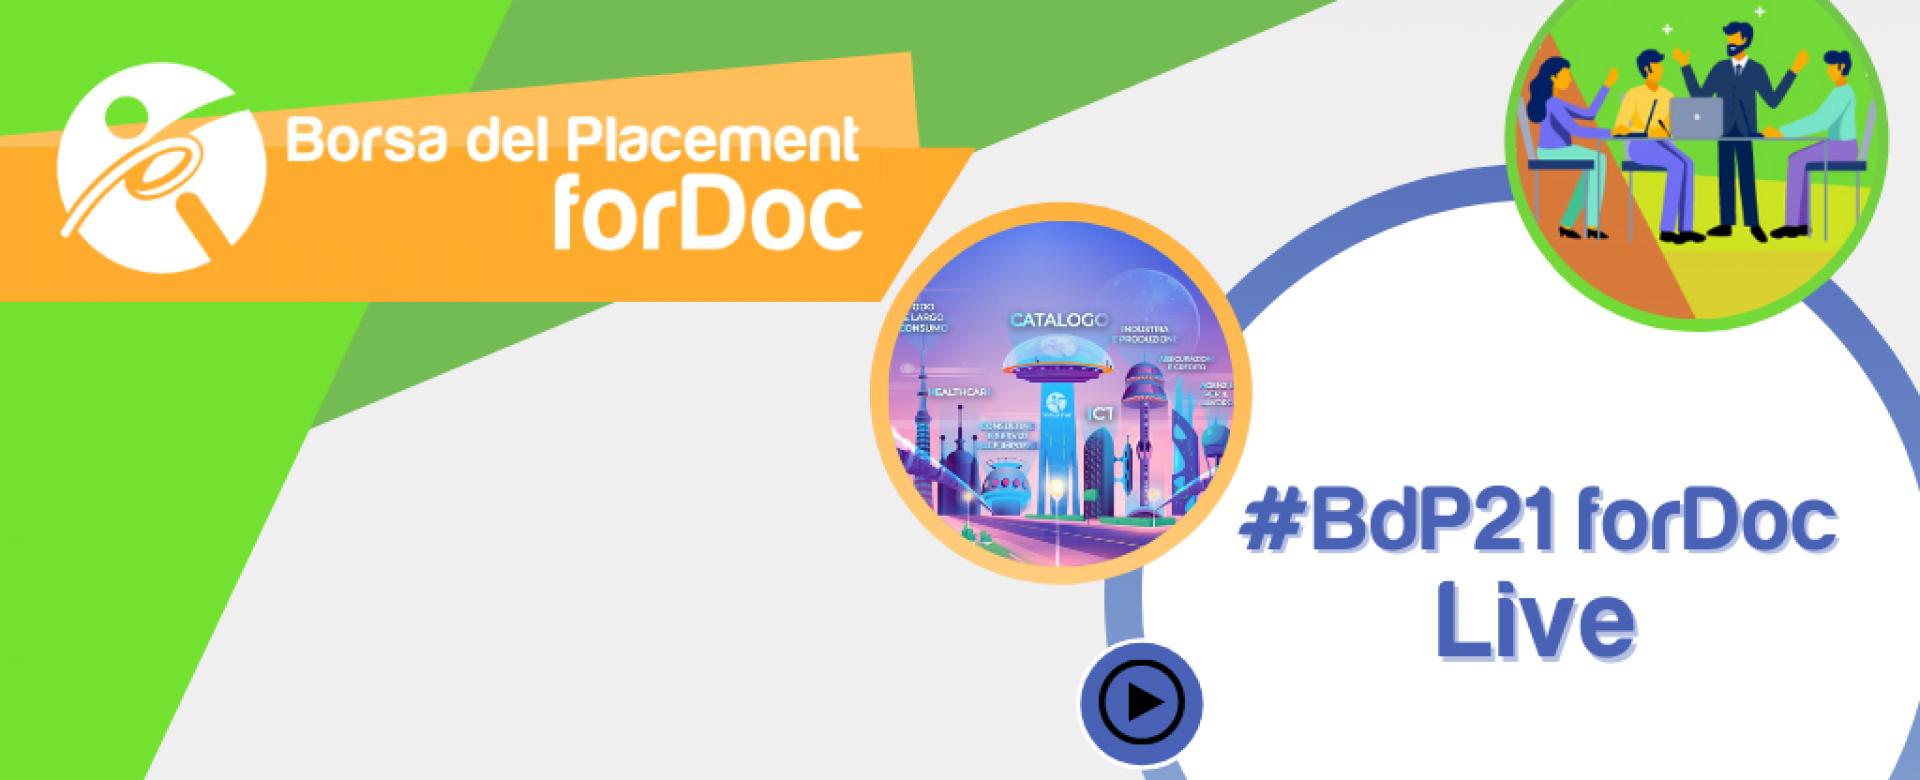 13.05.2021 - Borsa del Placement | forDoc | Live